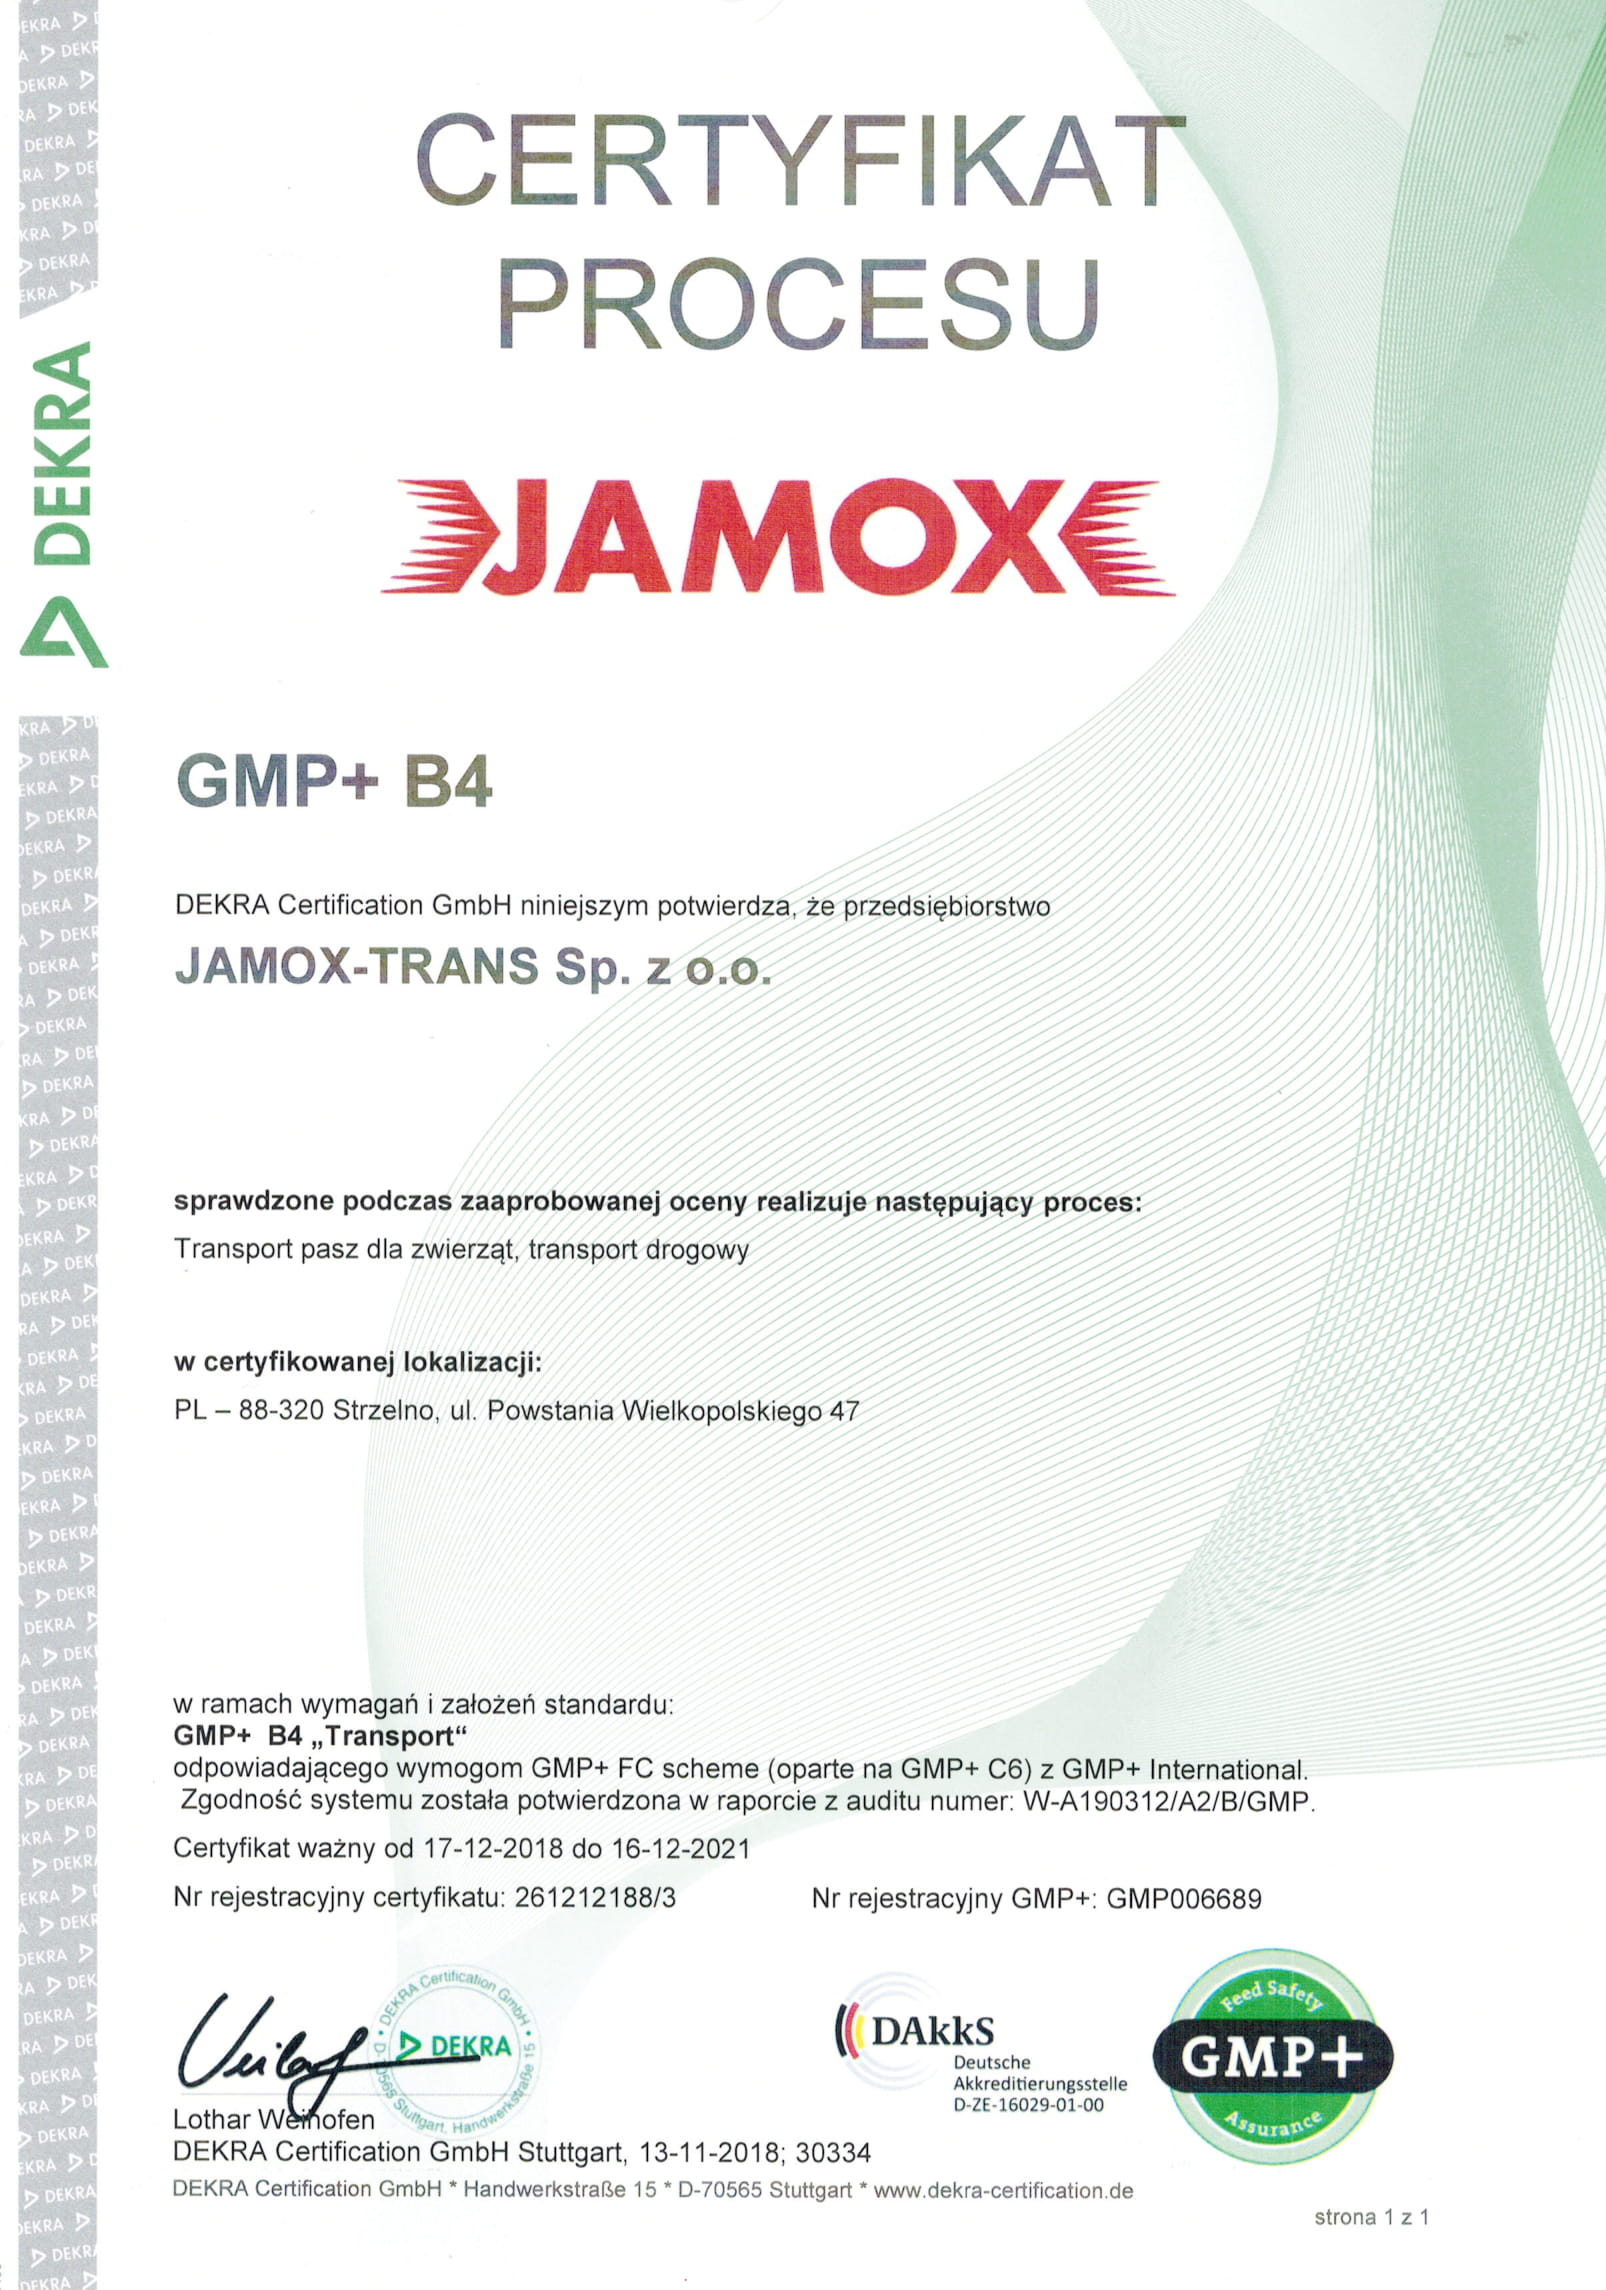 Jamox certyfikat GMP+